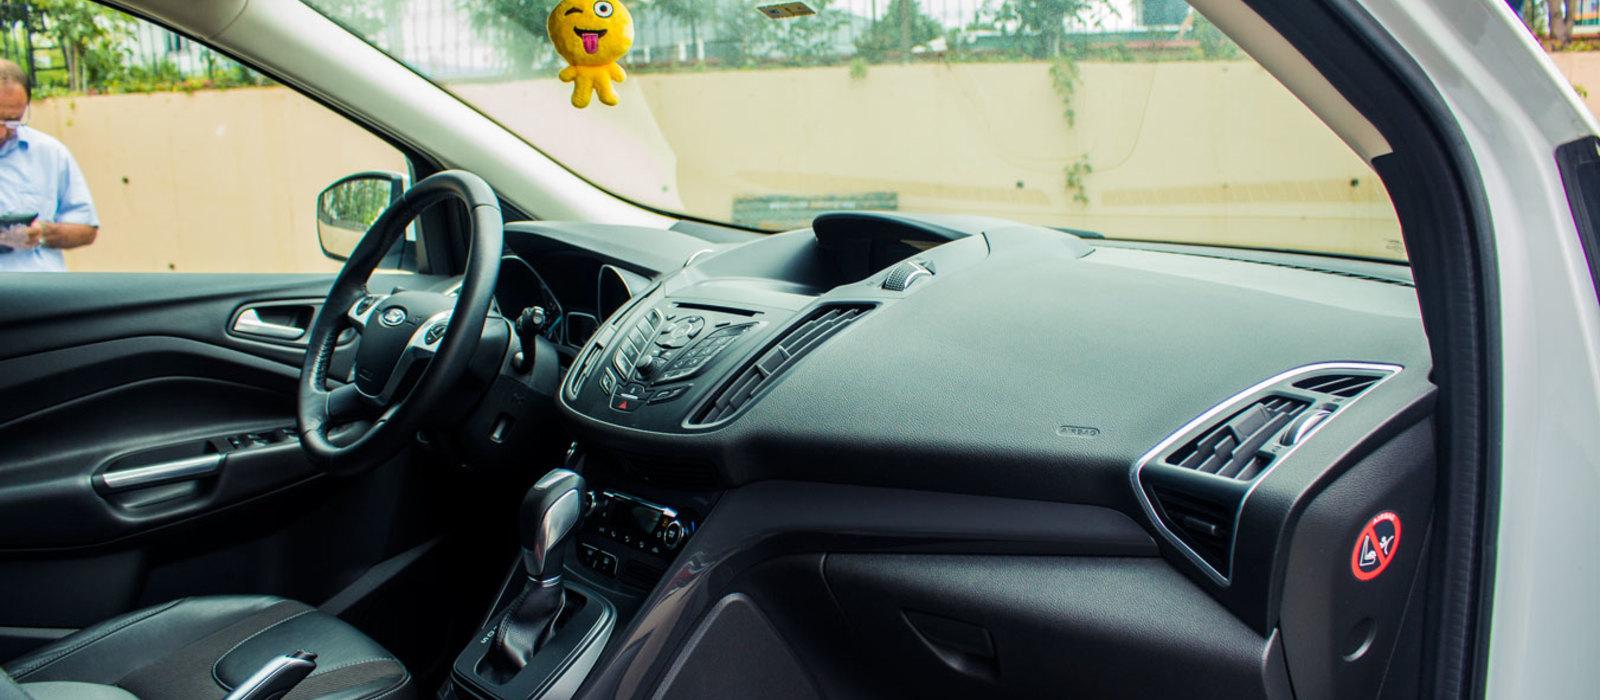 ikinci el araba 2014 Ford Kuga 1.6 EcoBoost Titanium Benzin Otomatik 14000 KM 10